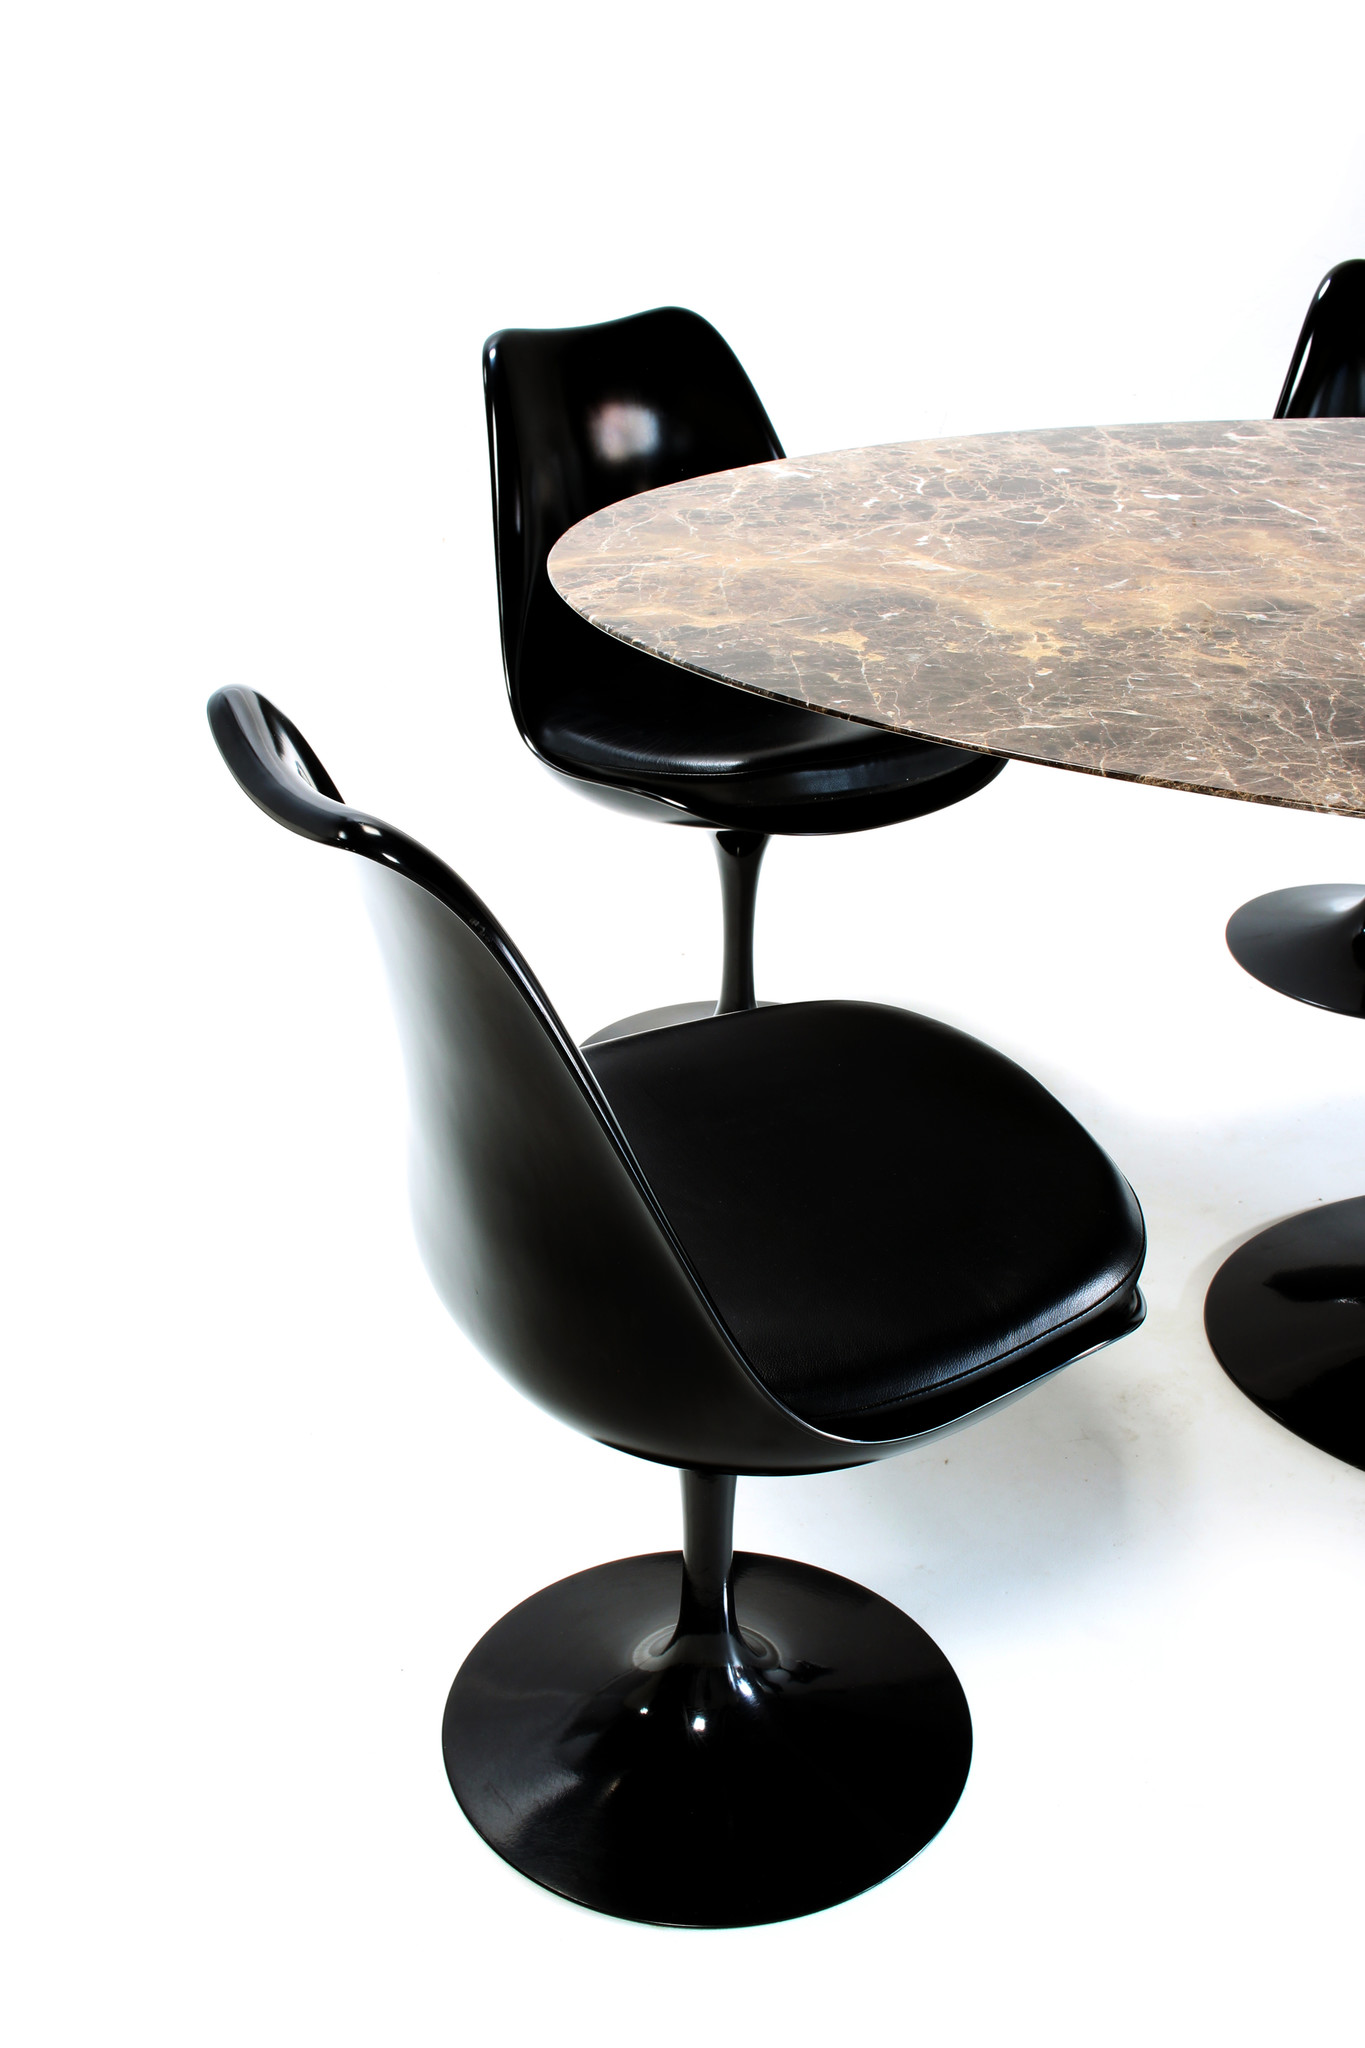 Eero Saarinen Knoll oval table with matching tulip chairs.